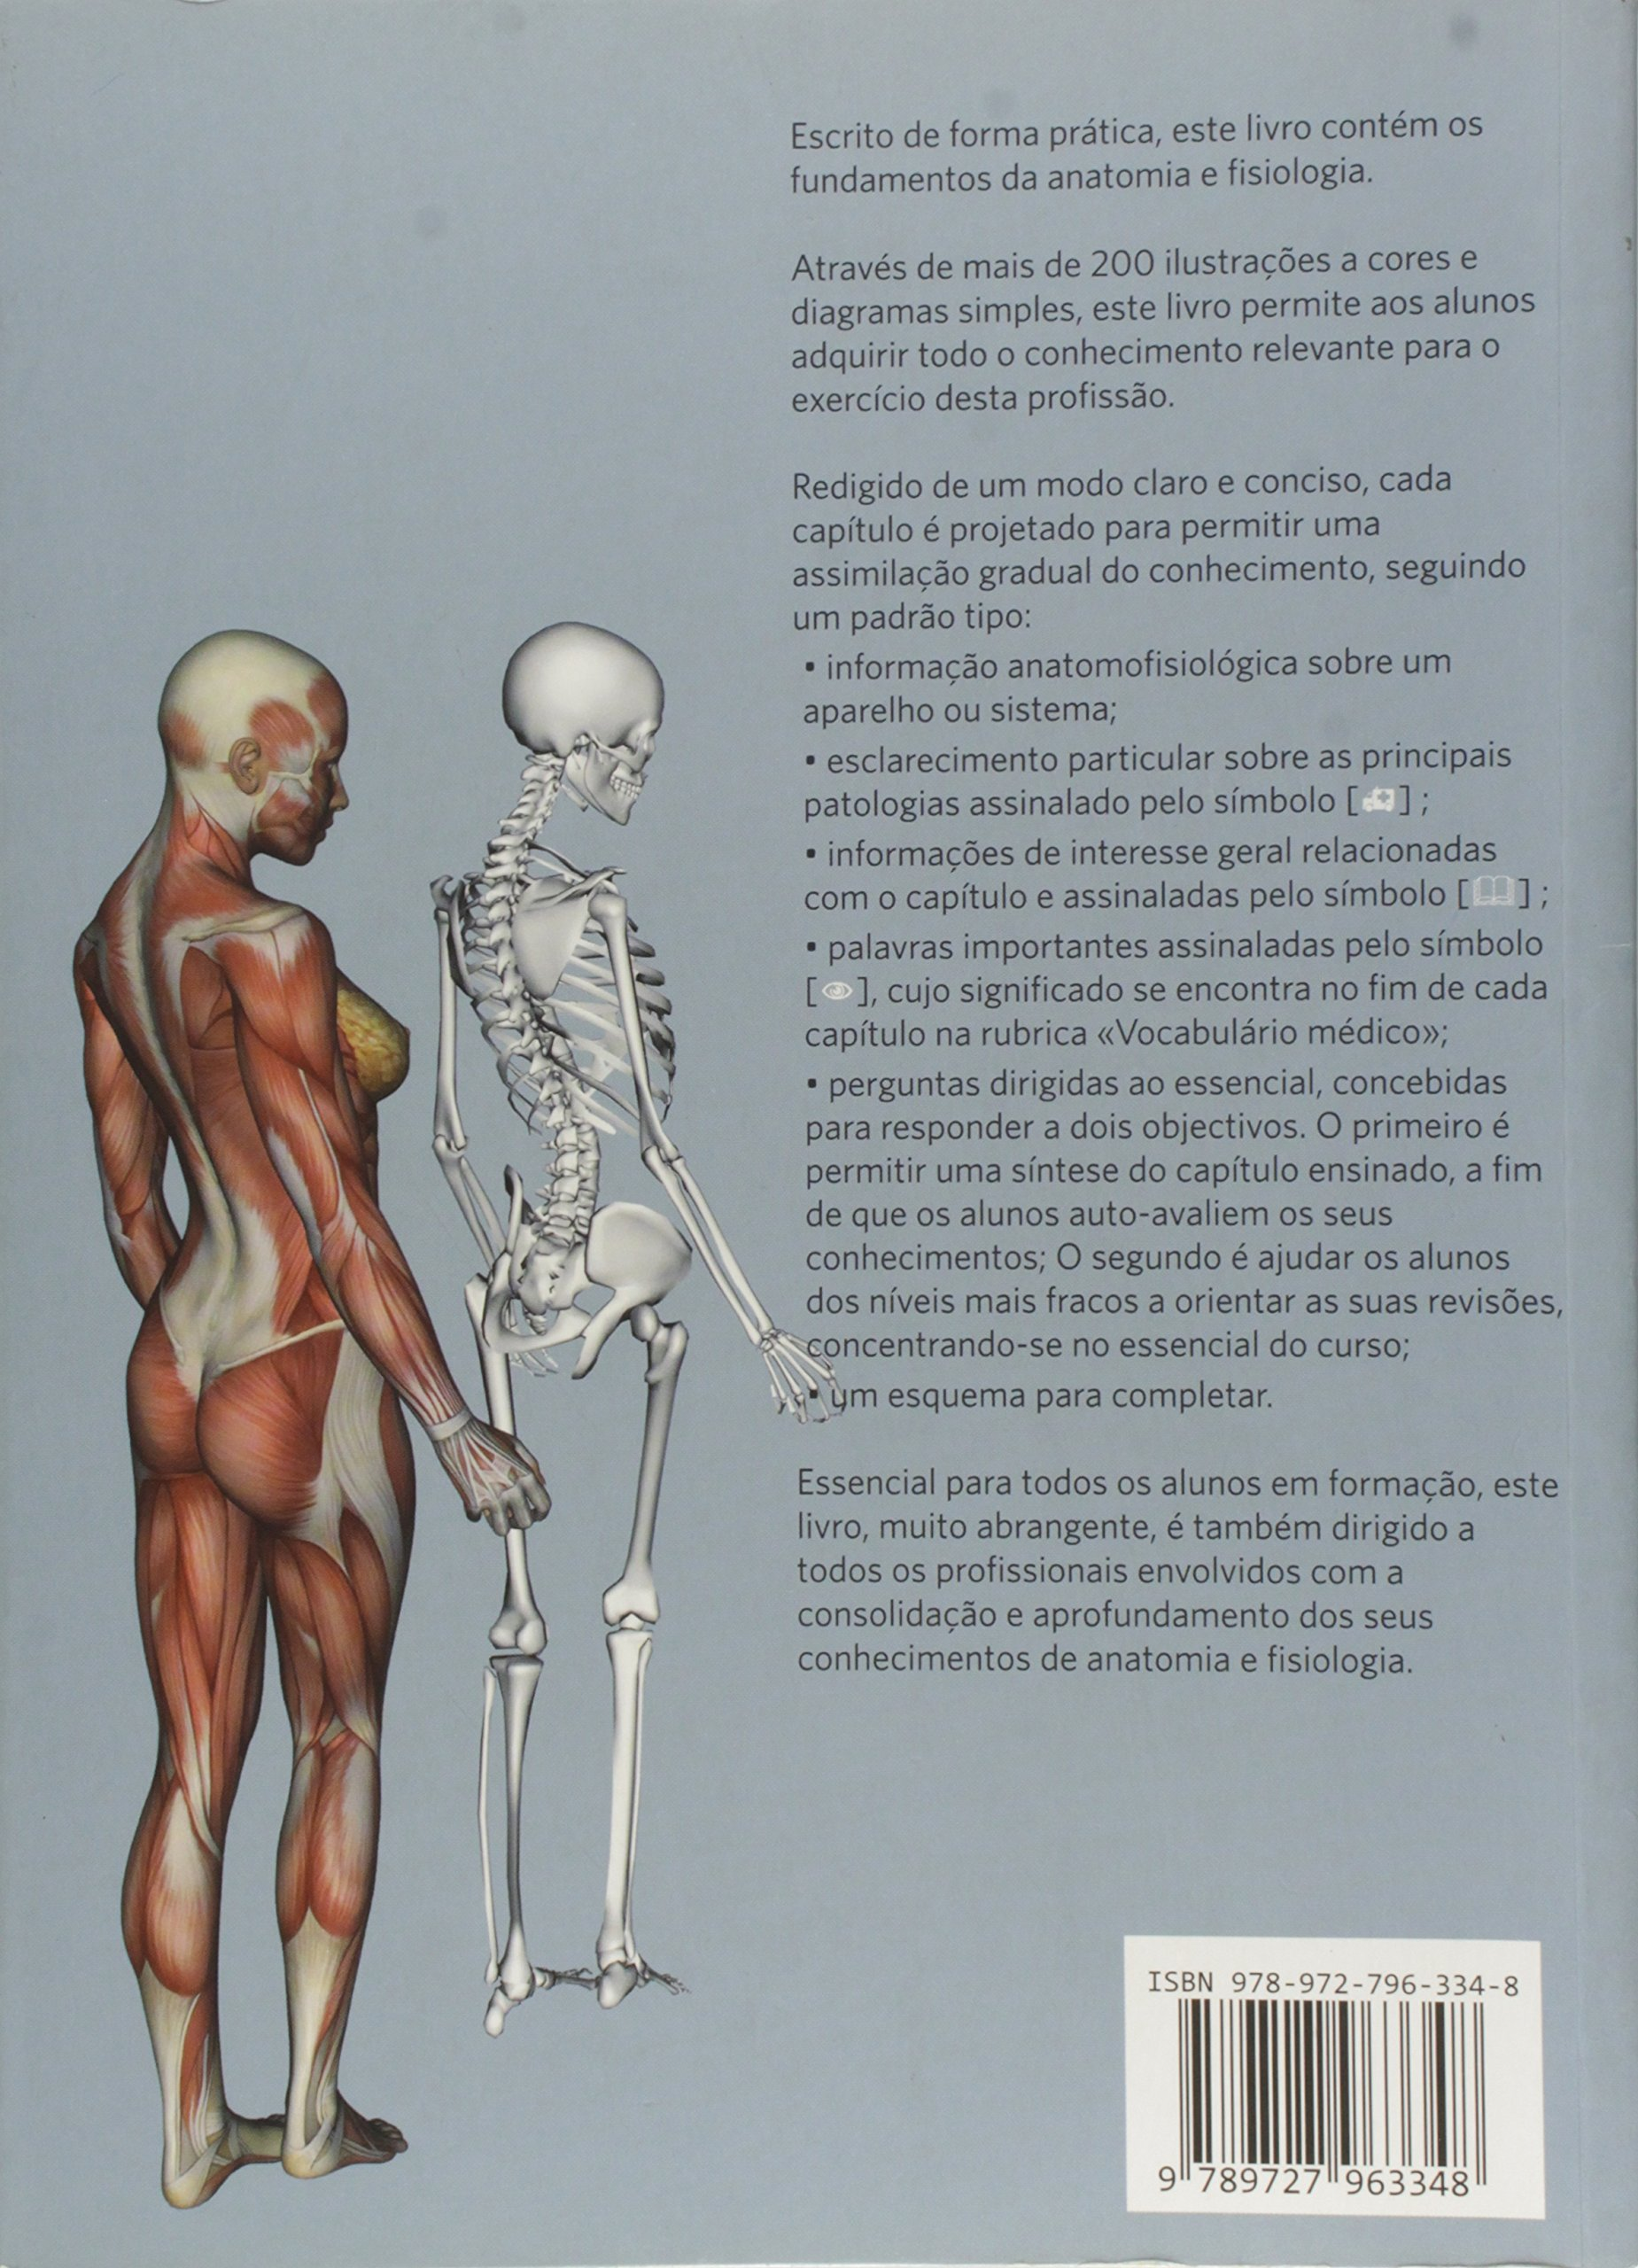 Anatomia e Fisiologia: Amazon.es: Sylvie Thérond, Alain Ramé: Libros